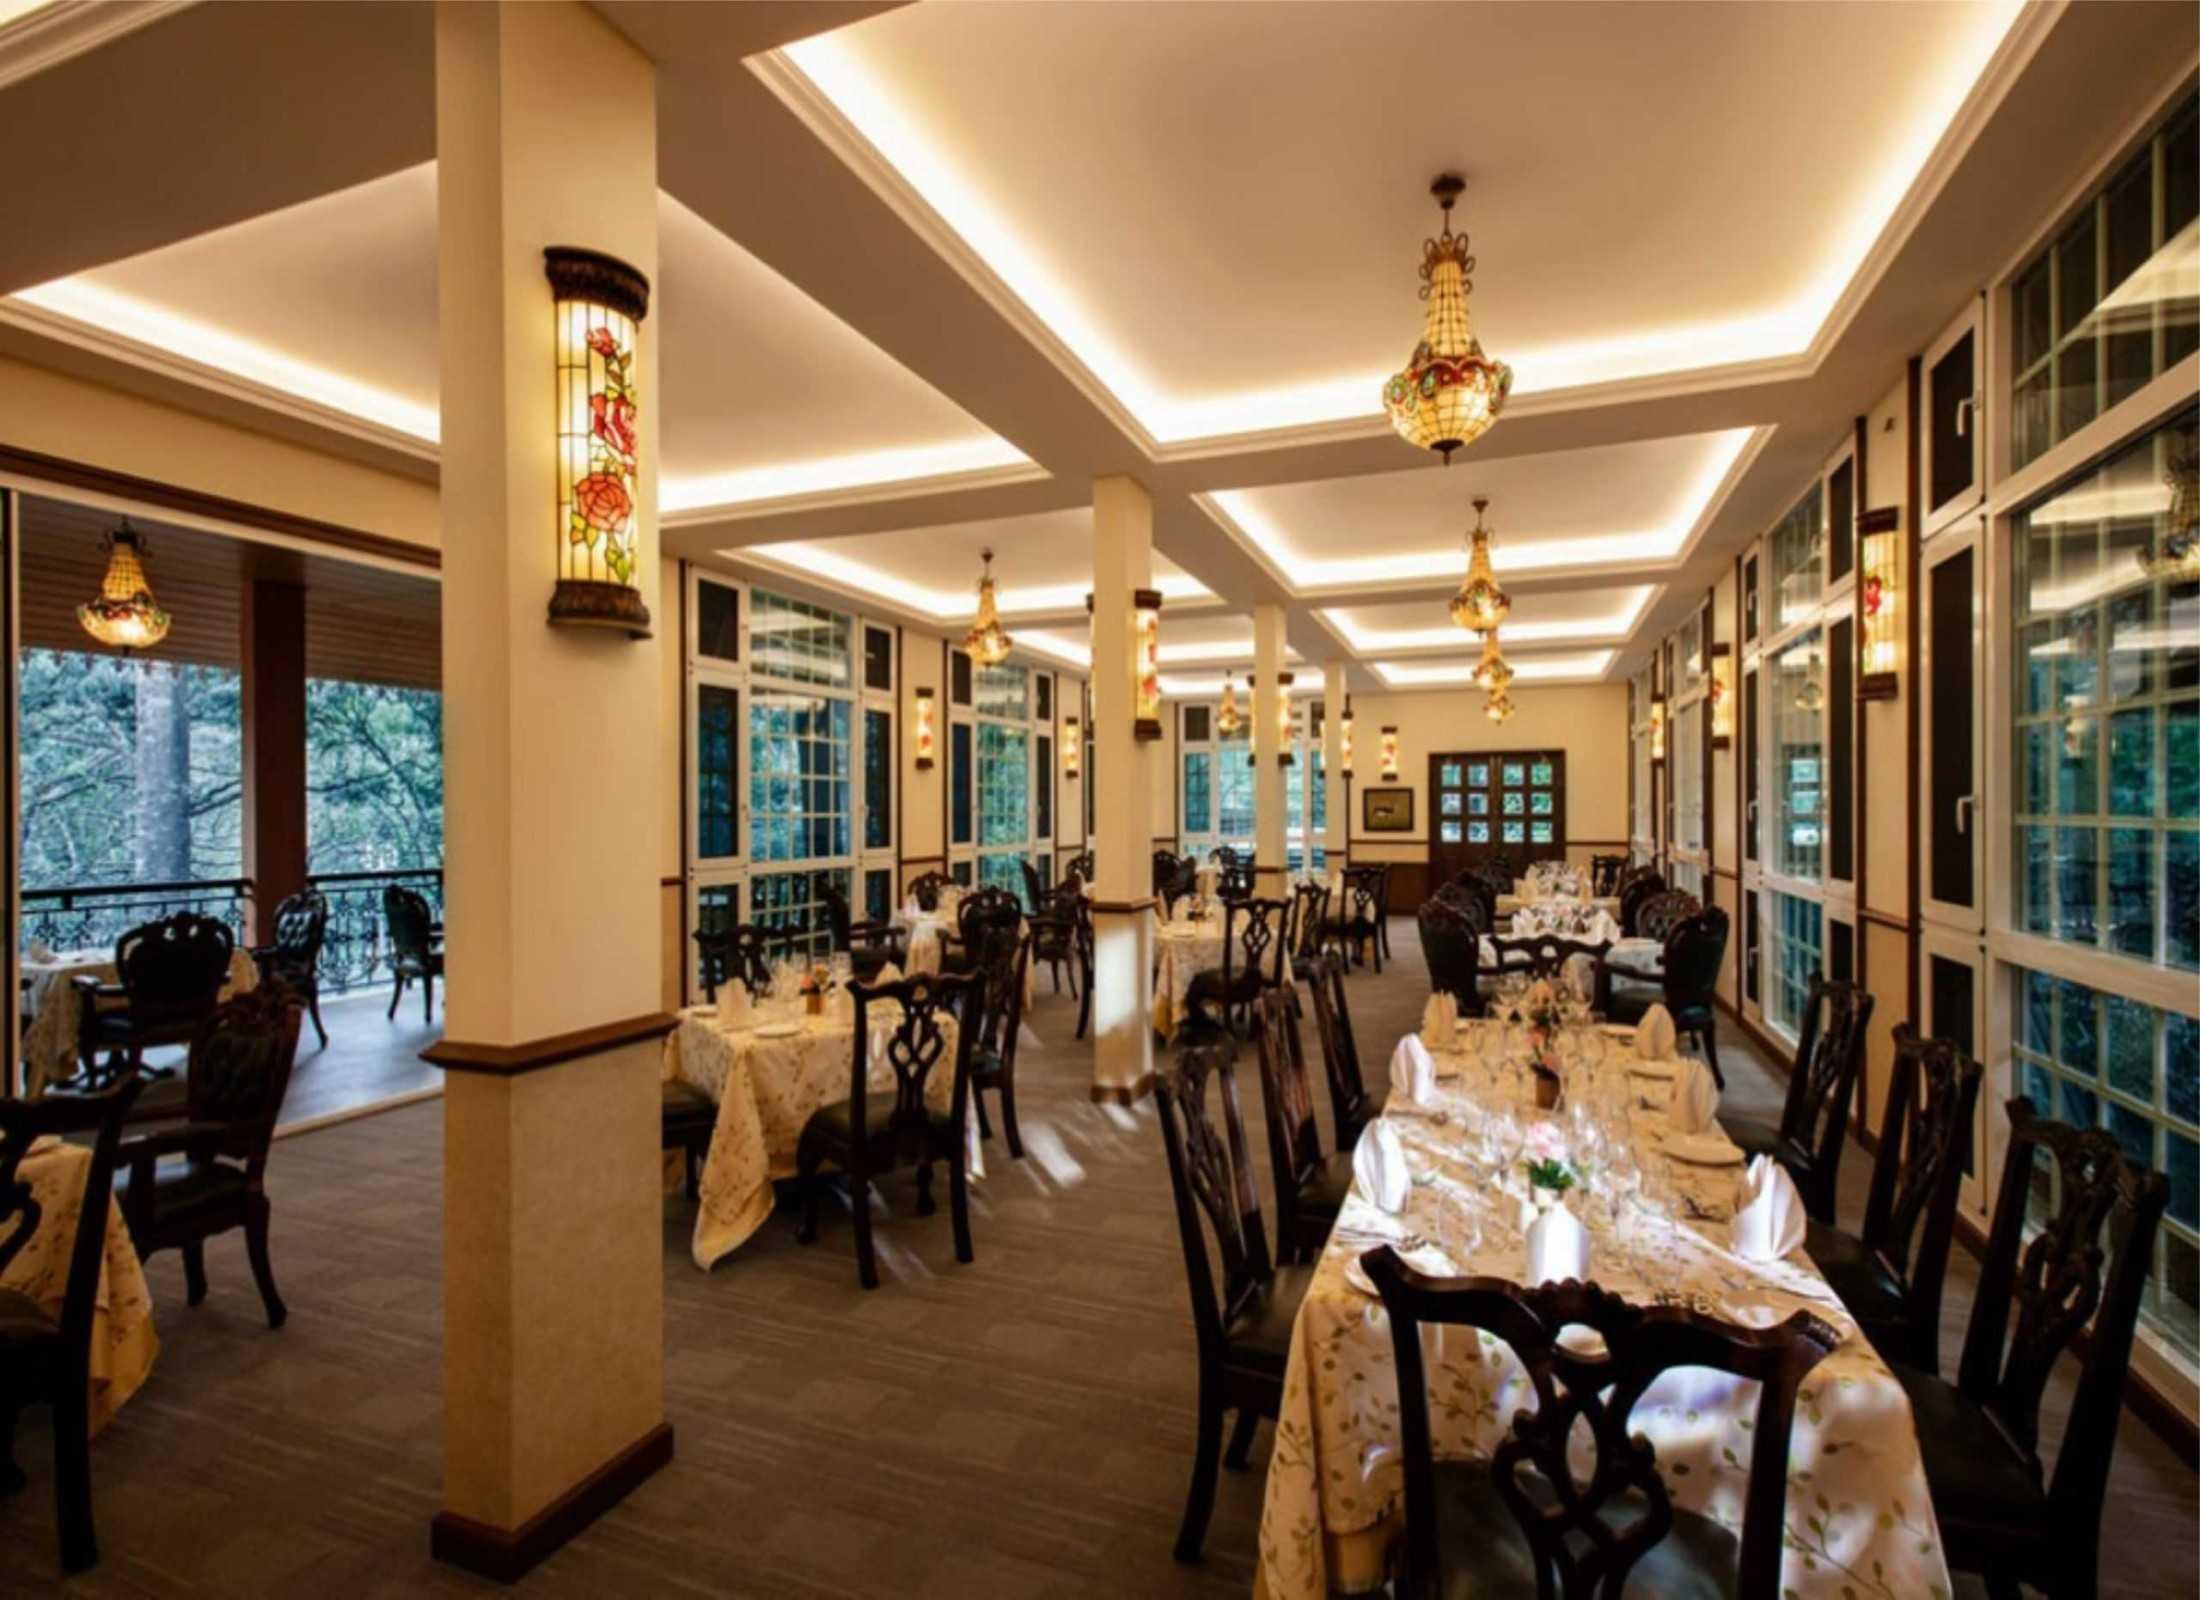 Rekai Design Interior Coorg Wilderness Resort, Coorg-India Virajpet, Main, Mysore - Madikeri Rd, Madikeri, Karnataka 571201, India Virajpet, Main, Mysore - Madikeri Rd, Madikeri, Karnataka 571201, India Rekai-Design-Interior-Coorg-Wilderness-Resort-Coorg-India  113304